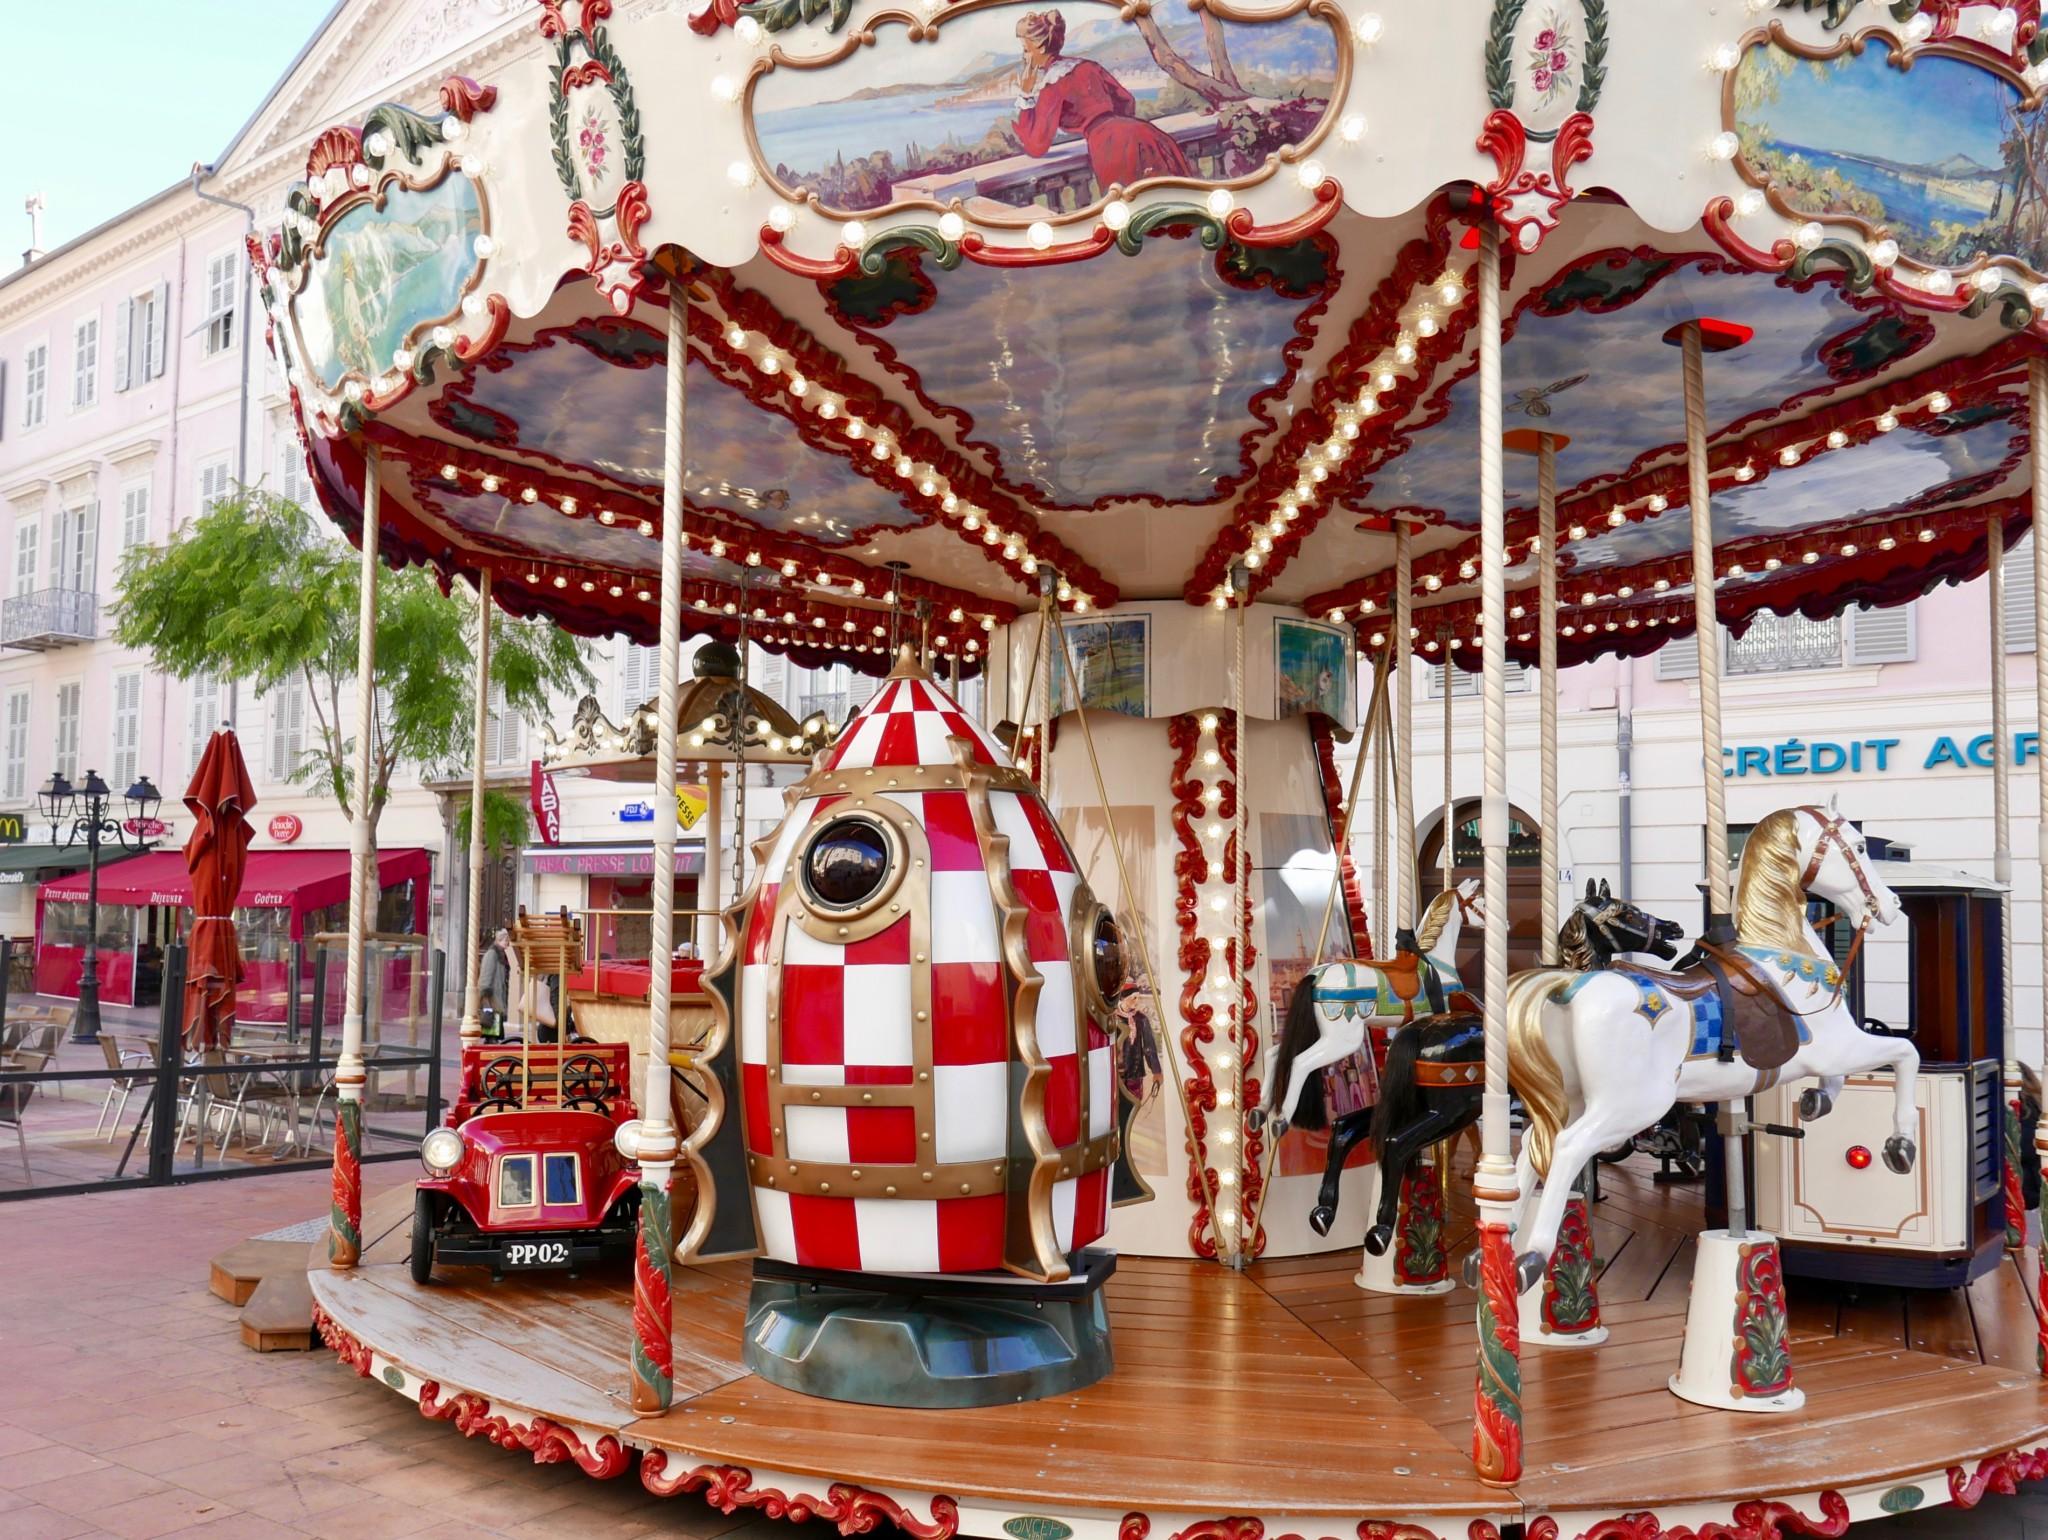 karusell-menton-frankrike-cote-azur